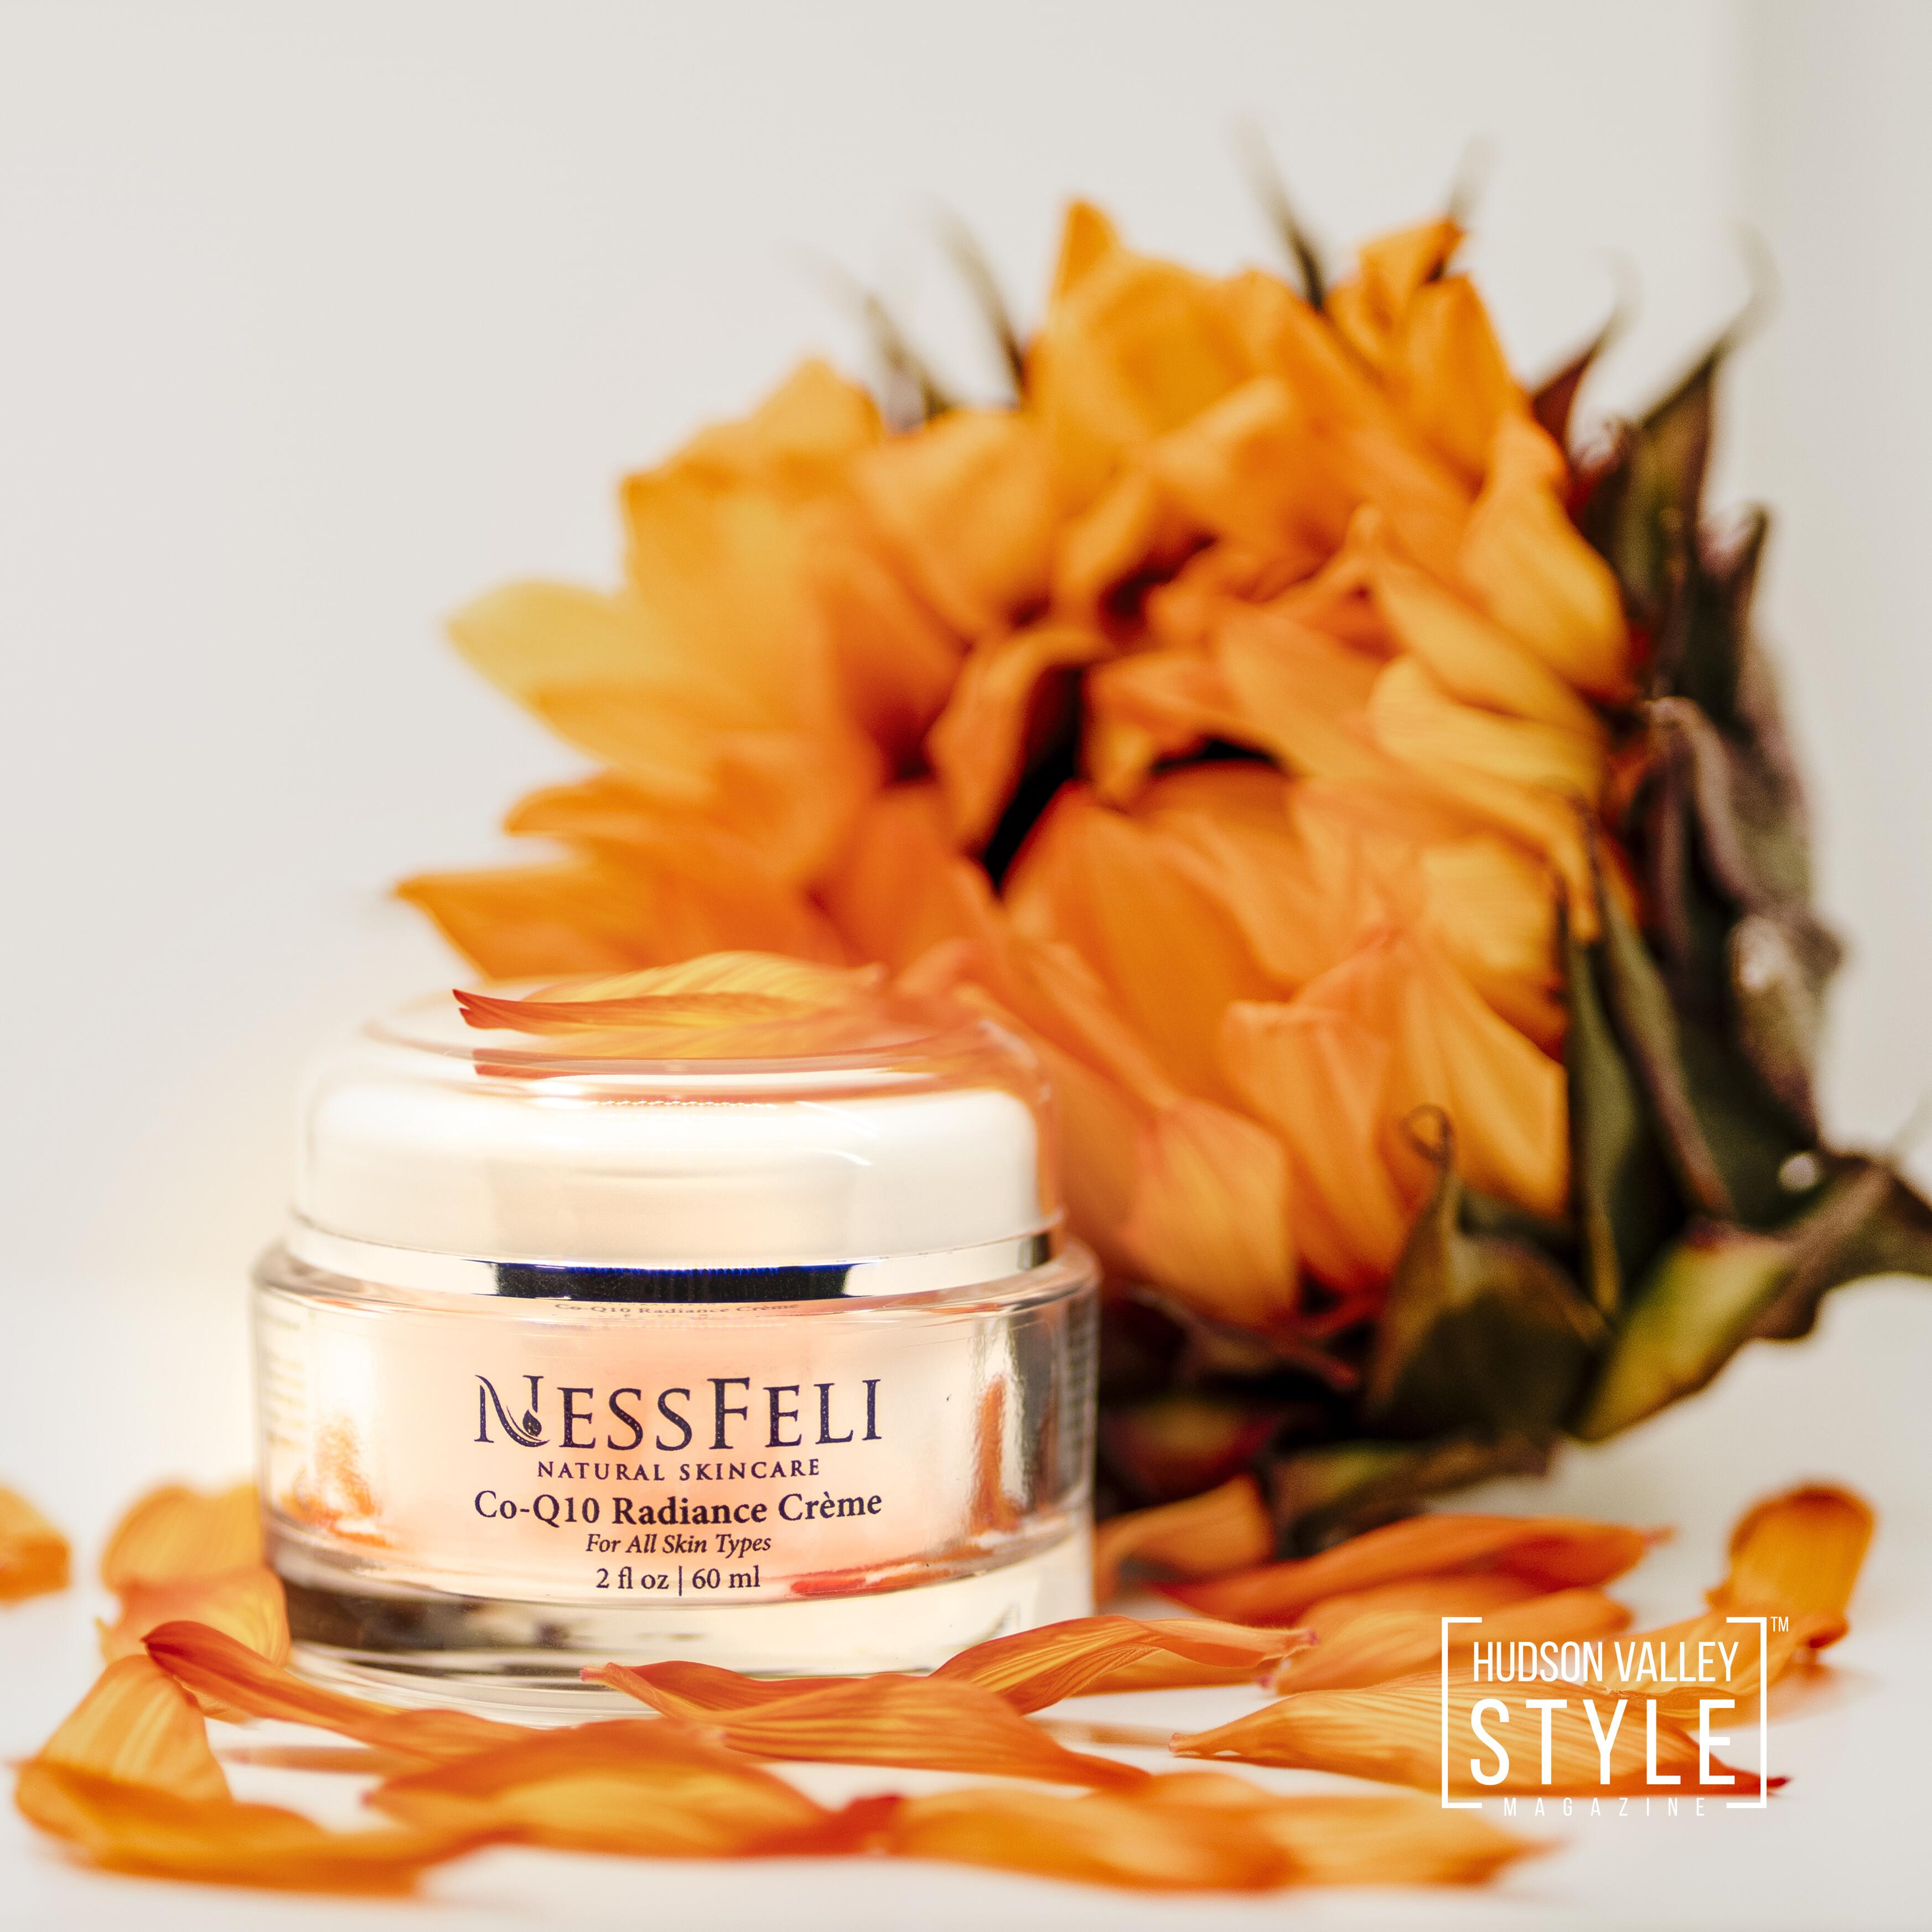 Co-Q10 Radiance Crème by Nessfeli Natural Skincare